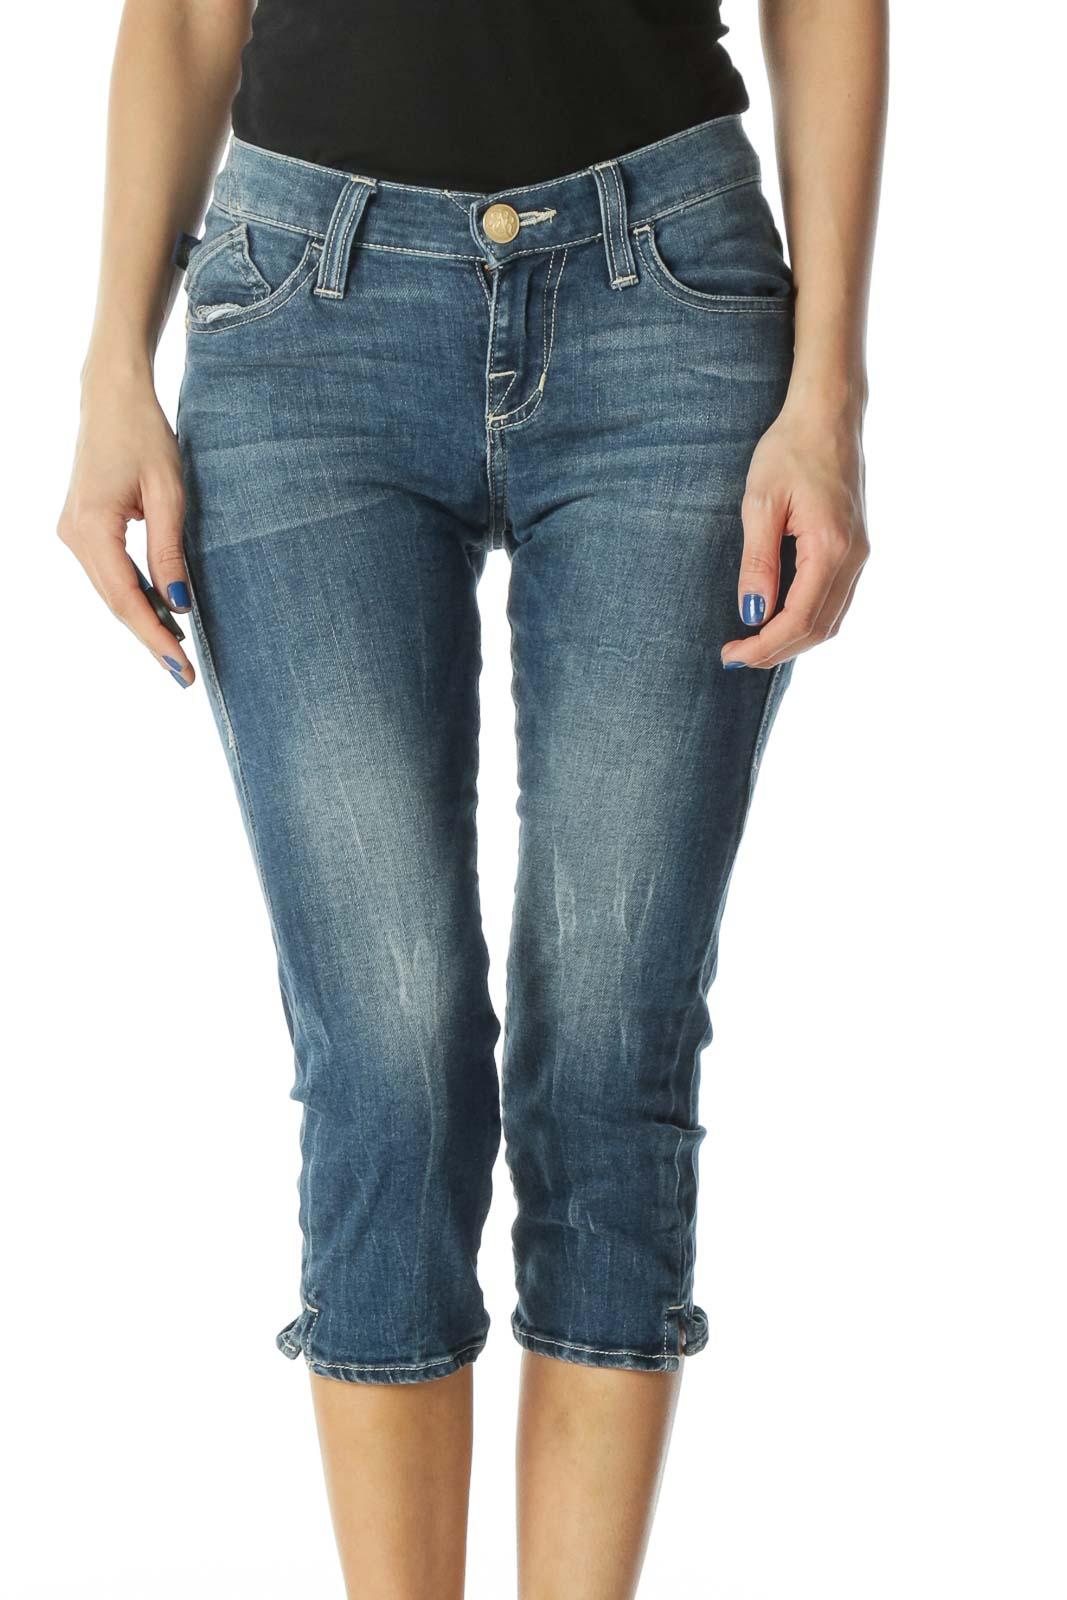 Embellished Cropped Skinny Jeans Front